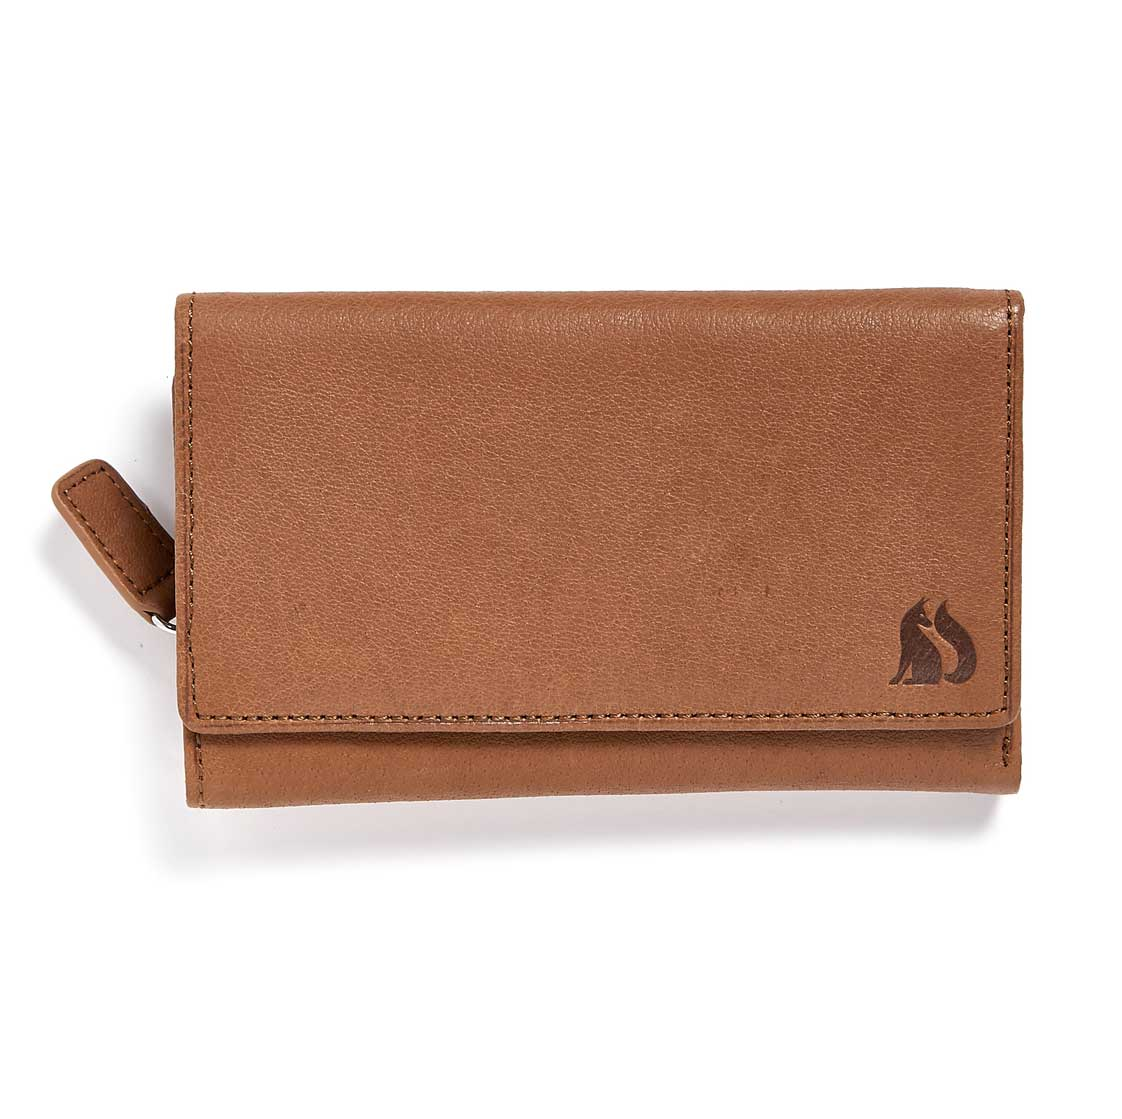 Foxfield Thirlmere Tan Leather Purse